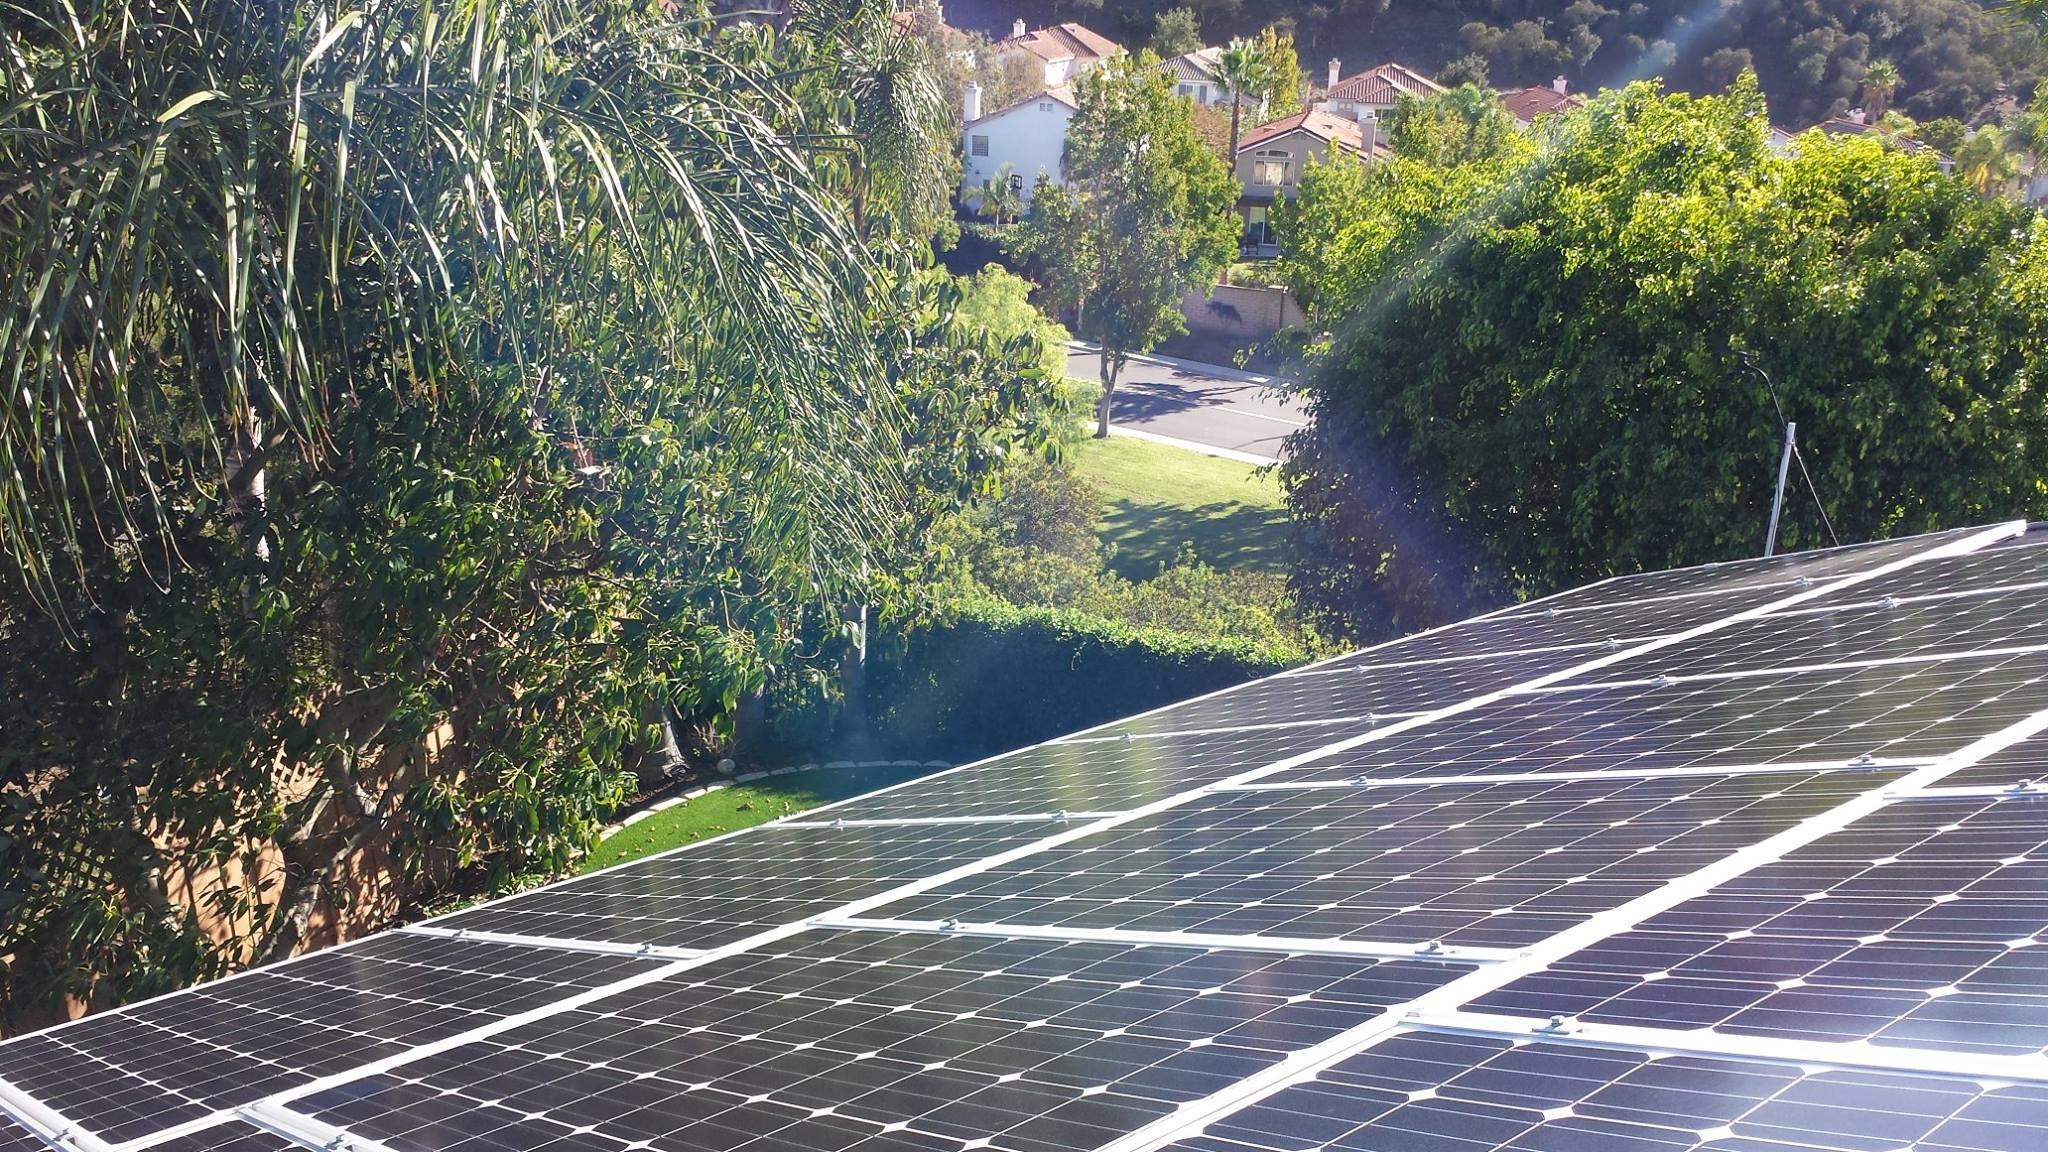 Residential Grid-tie Solar Electric Installation - by Damian Gutierrez Sept 2014, San Diego, CA